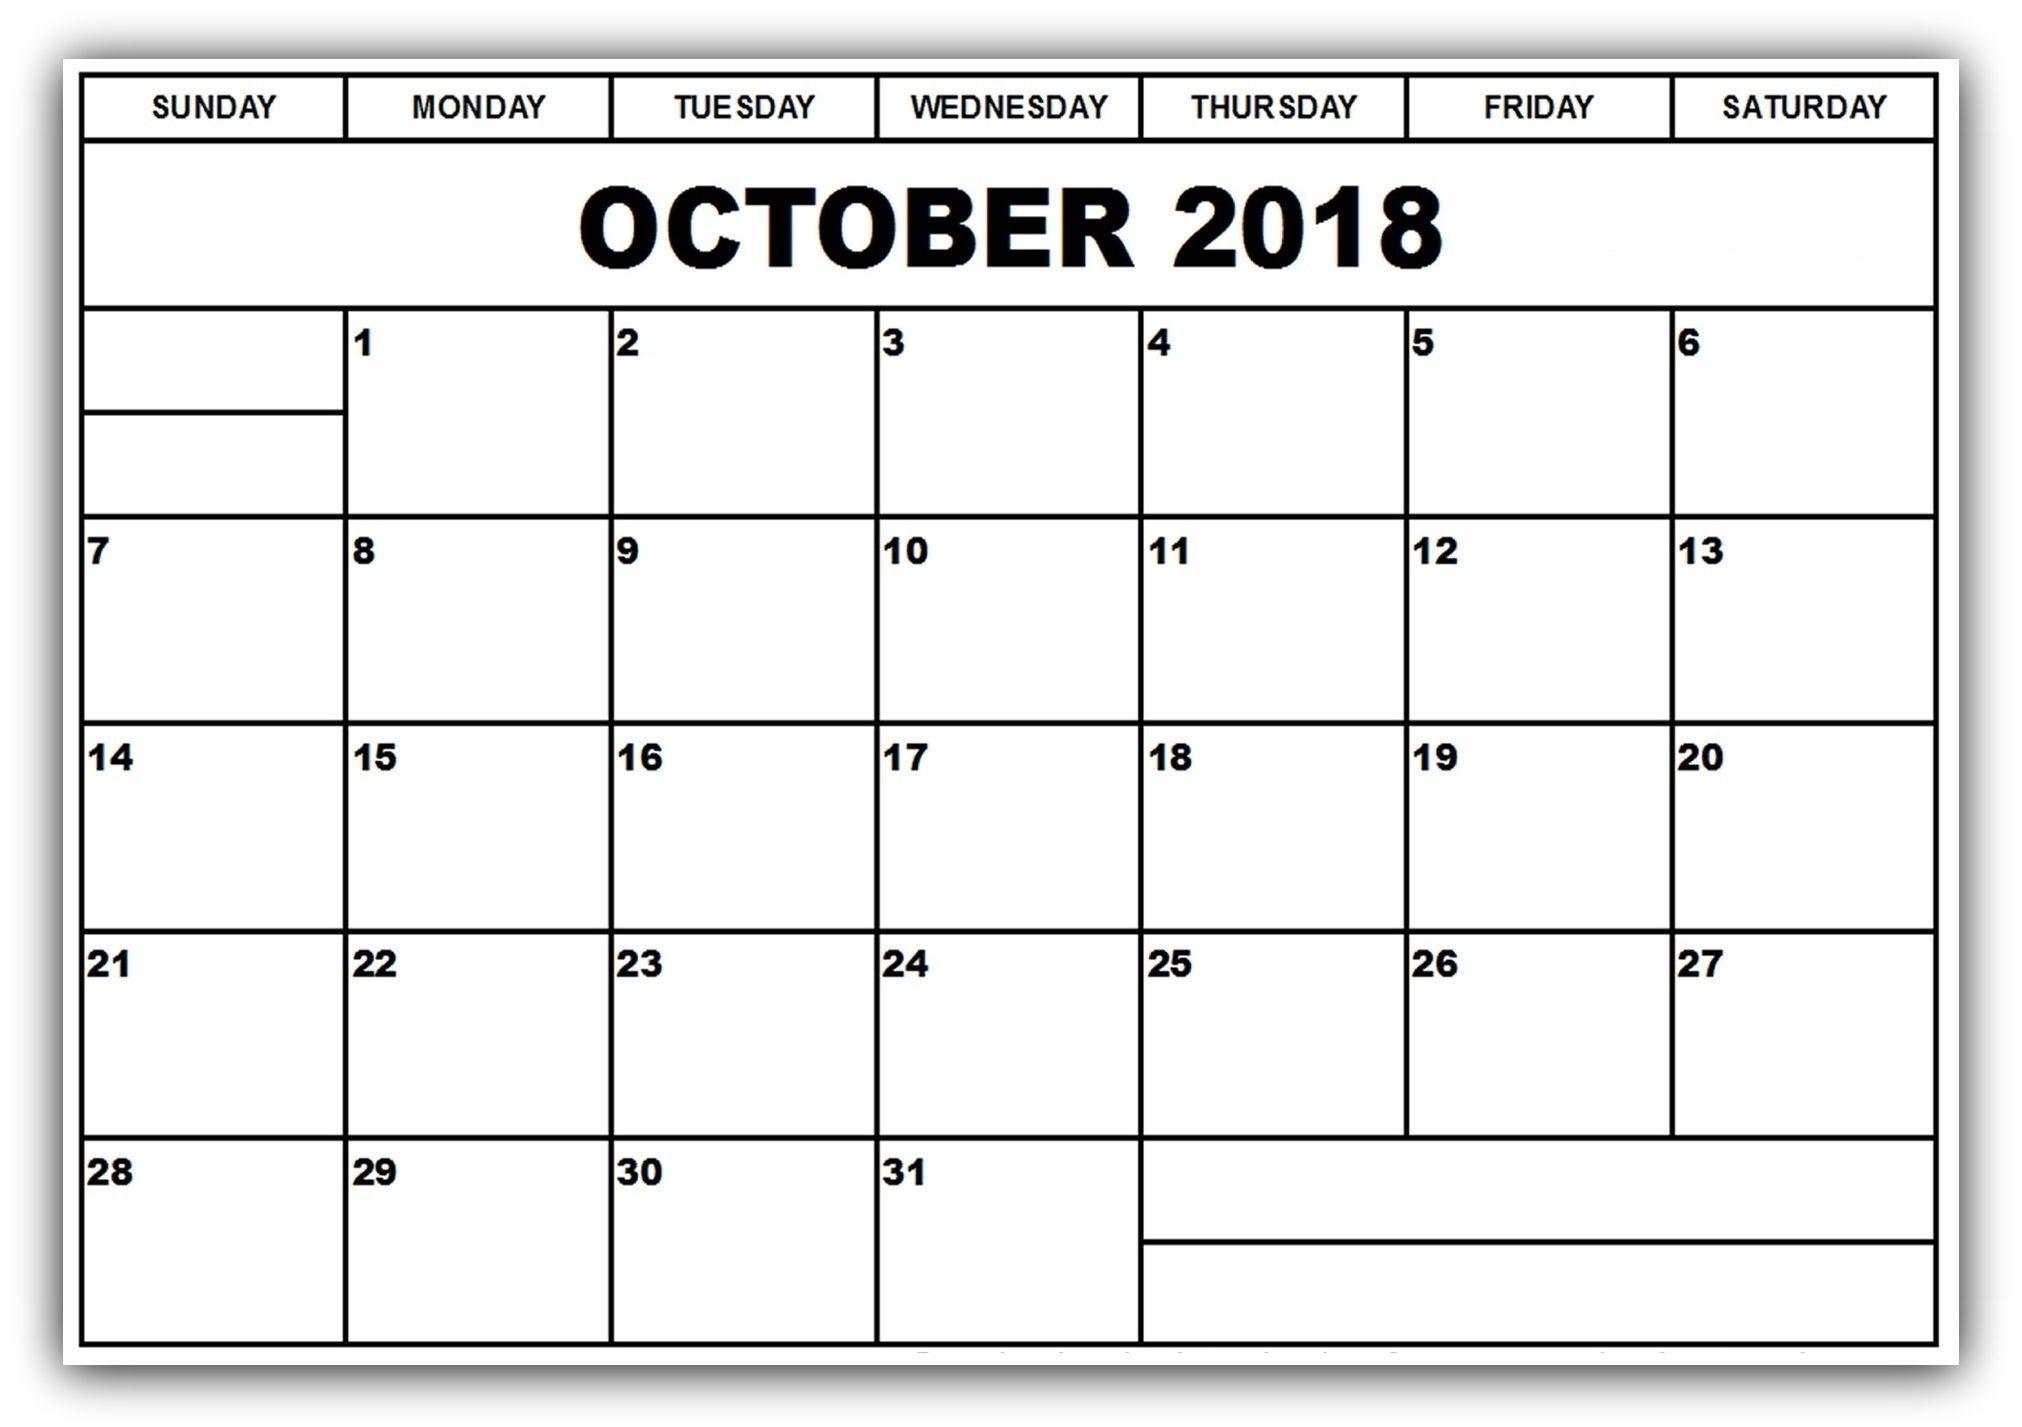 Good Calendar Template October Images Gallery October 2018